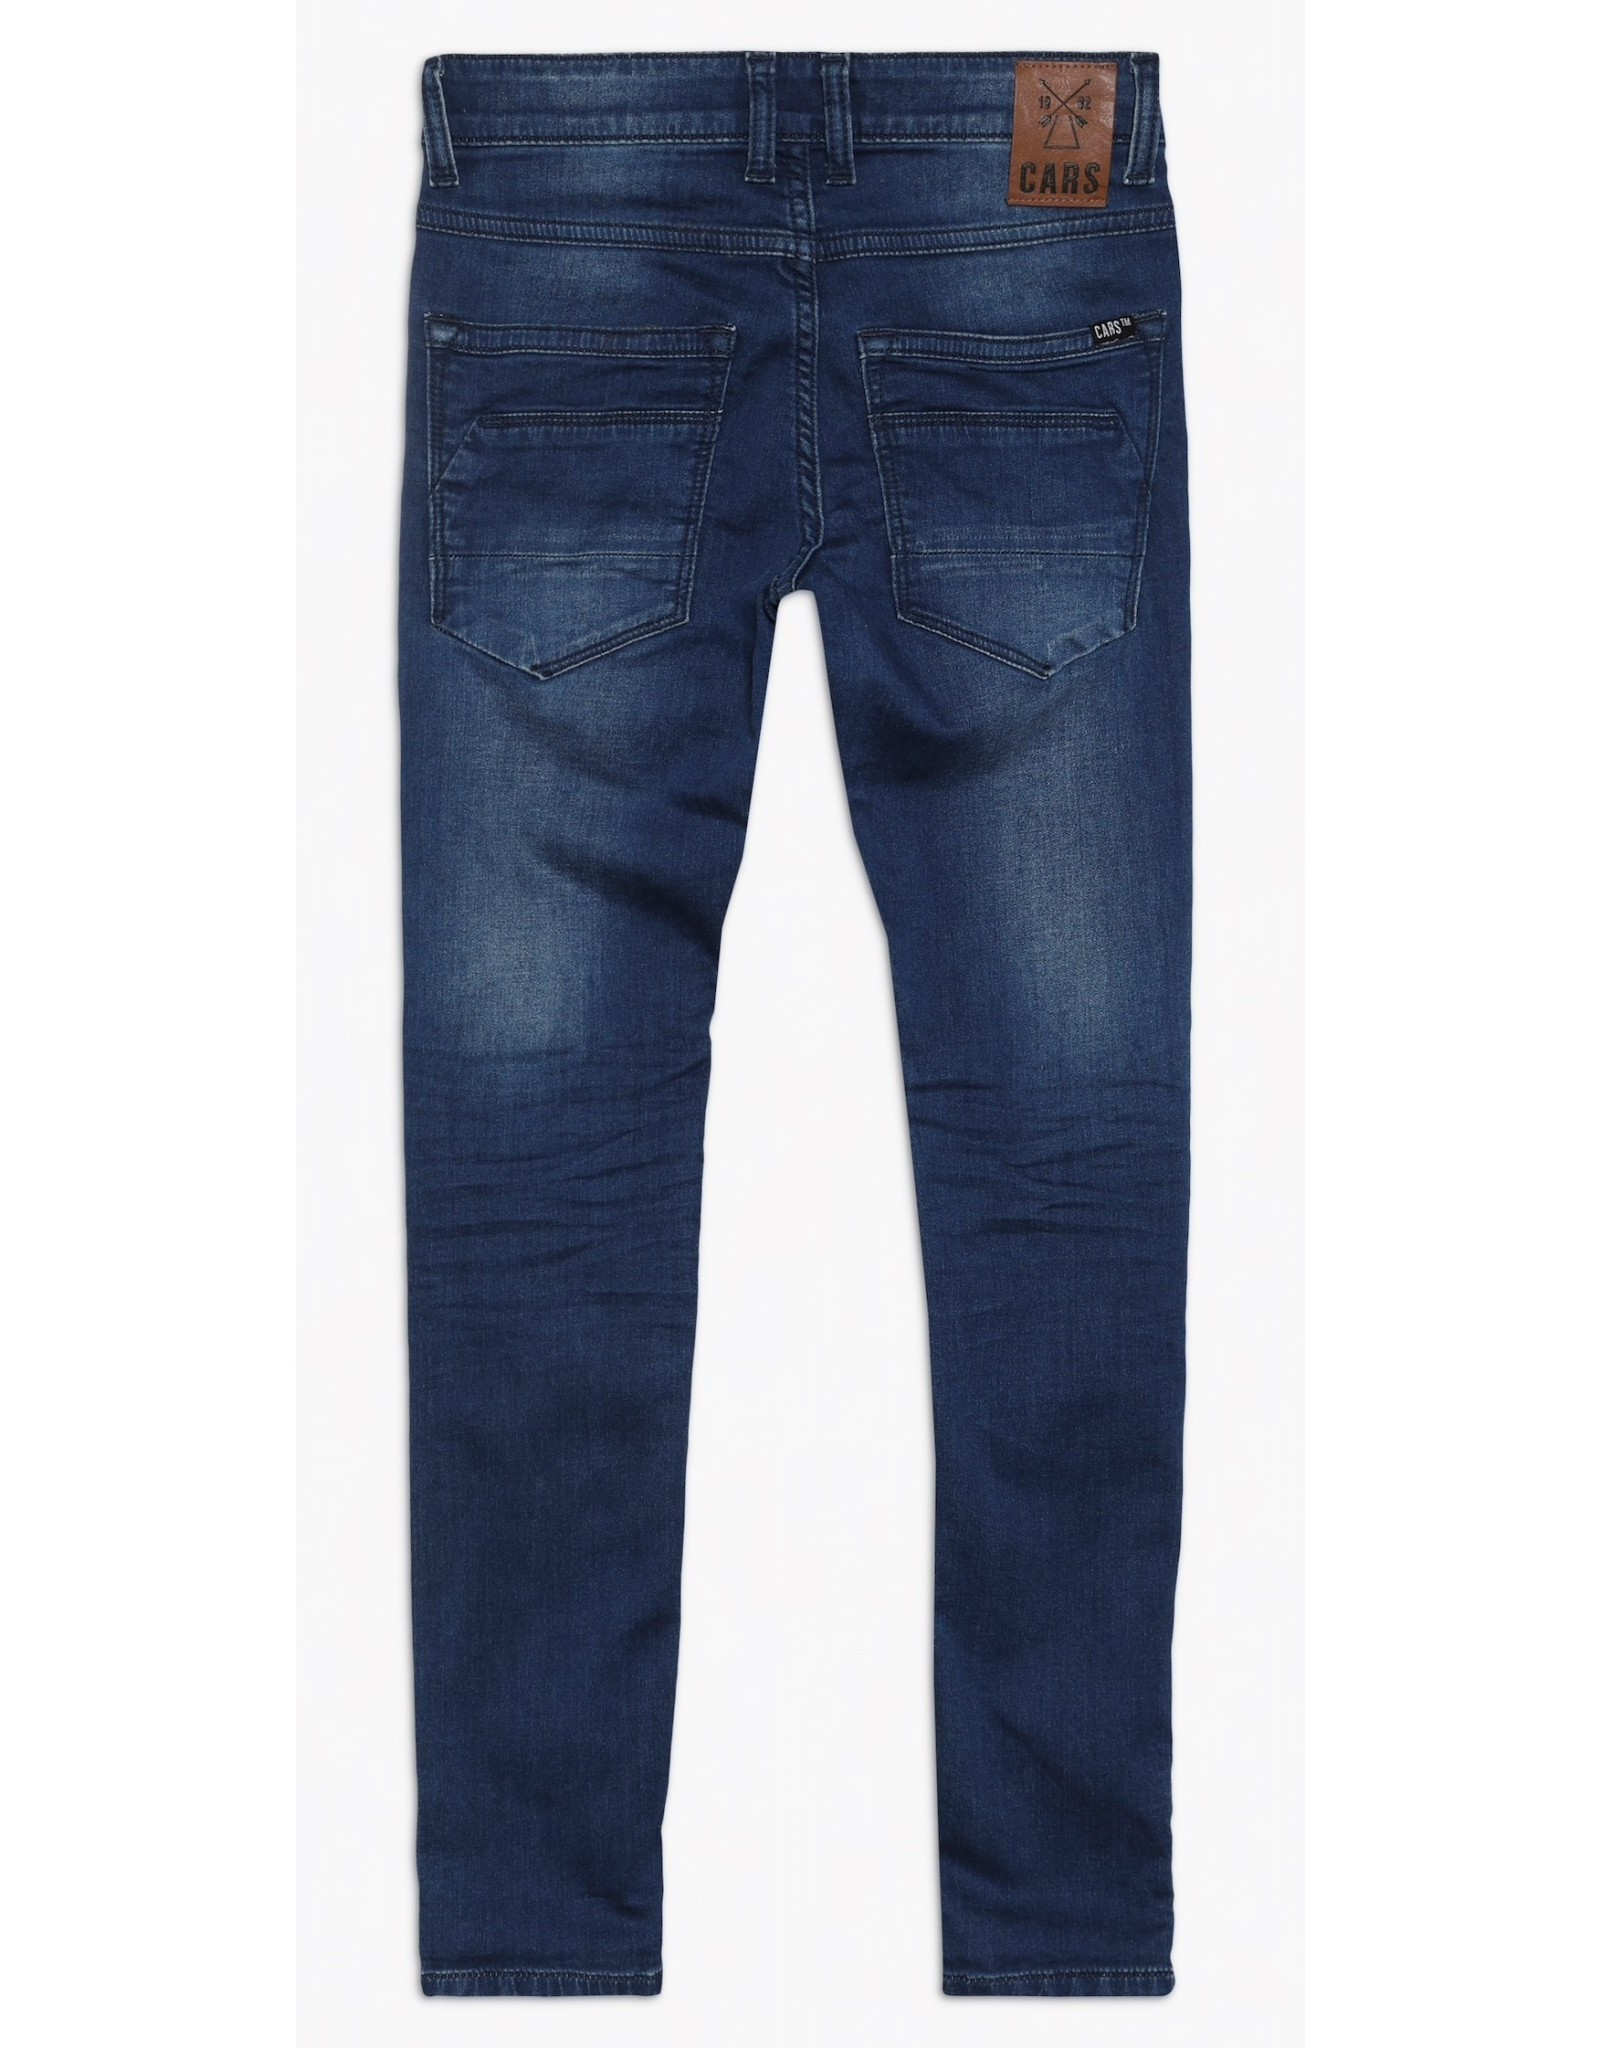 Cars Burgo Jog Jeans